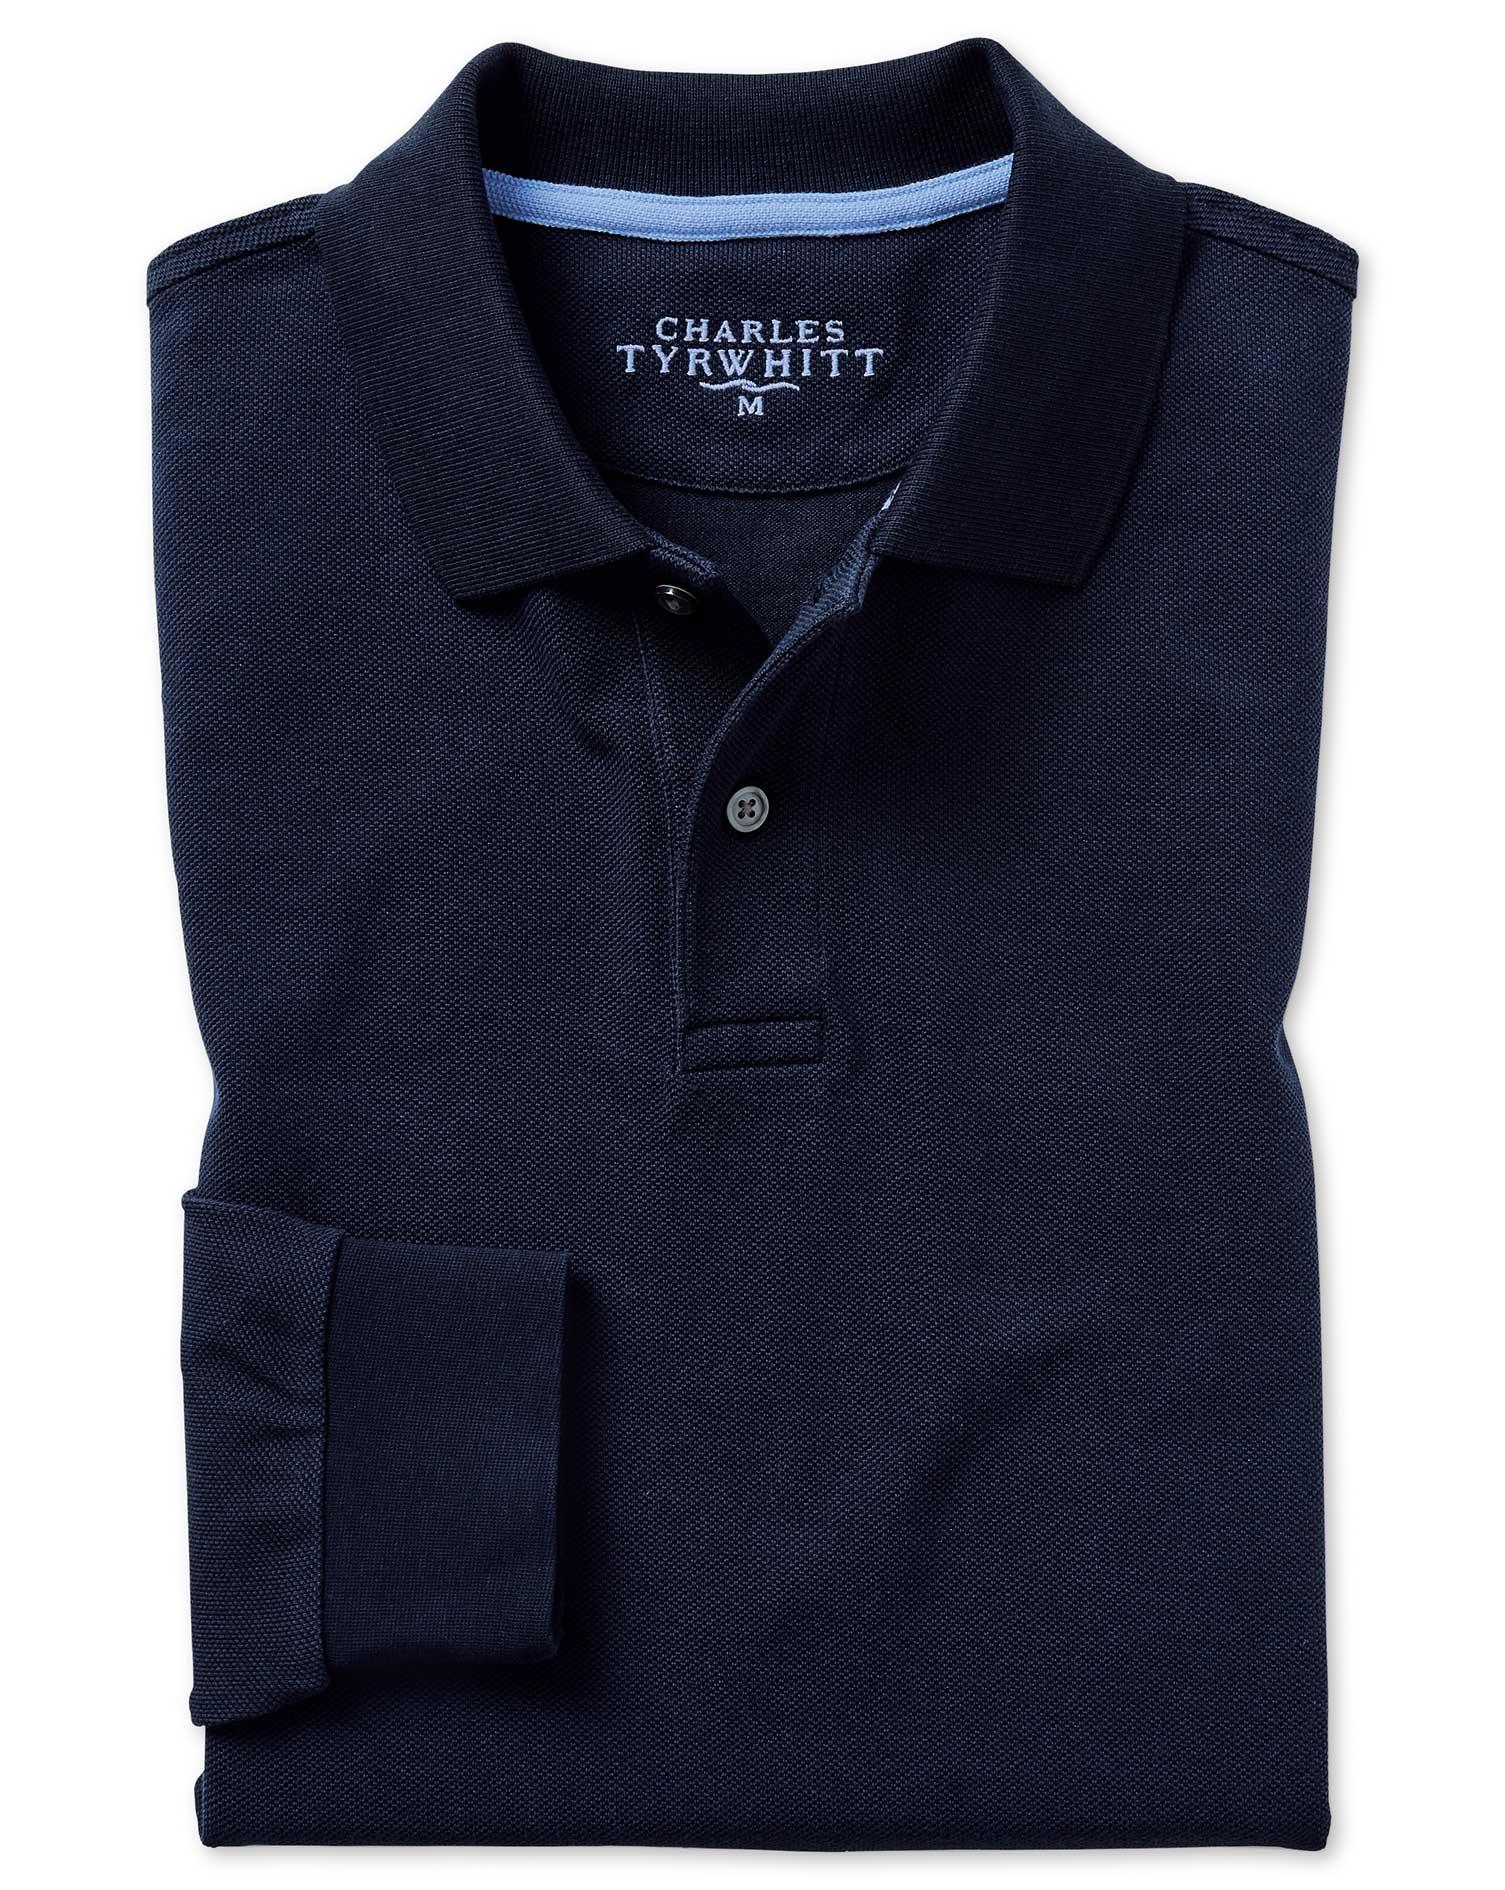 Navy Long Sleeve Plain Pique Cotton Polo Size Medium by Charles Tyrwhitt